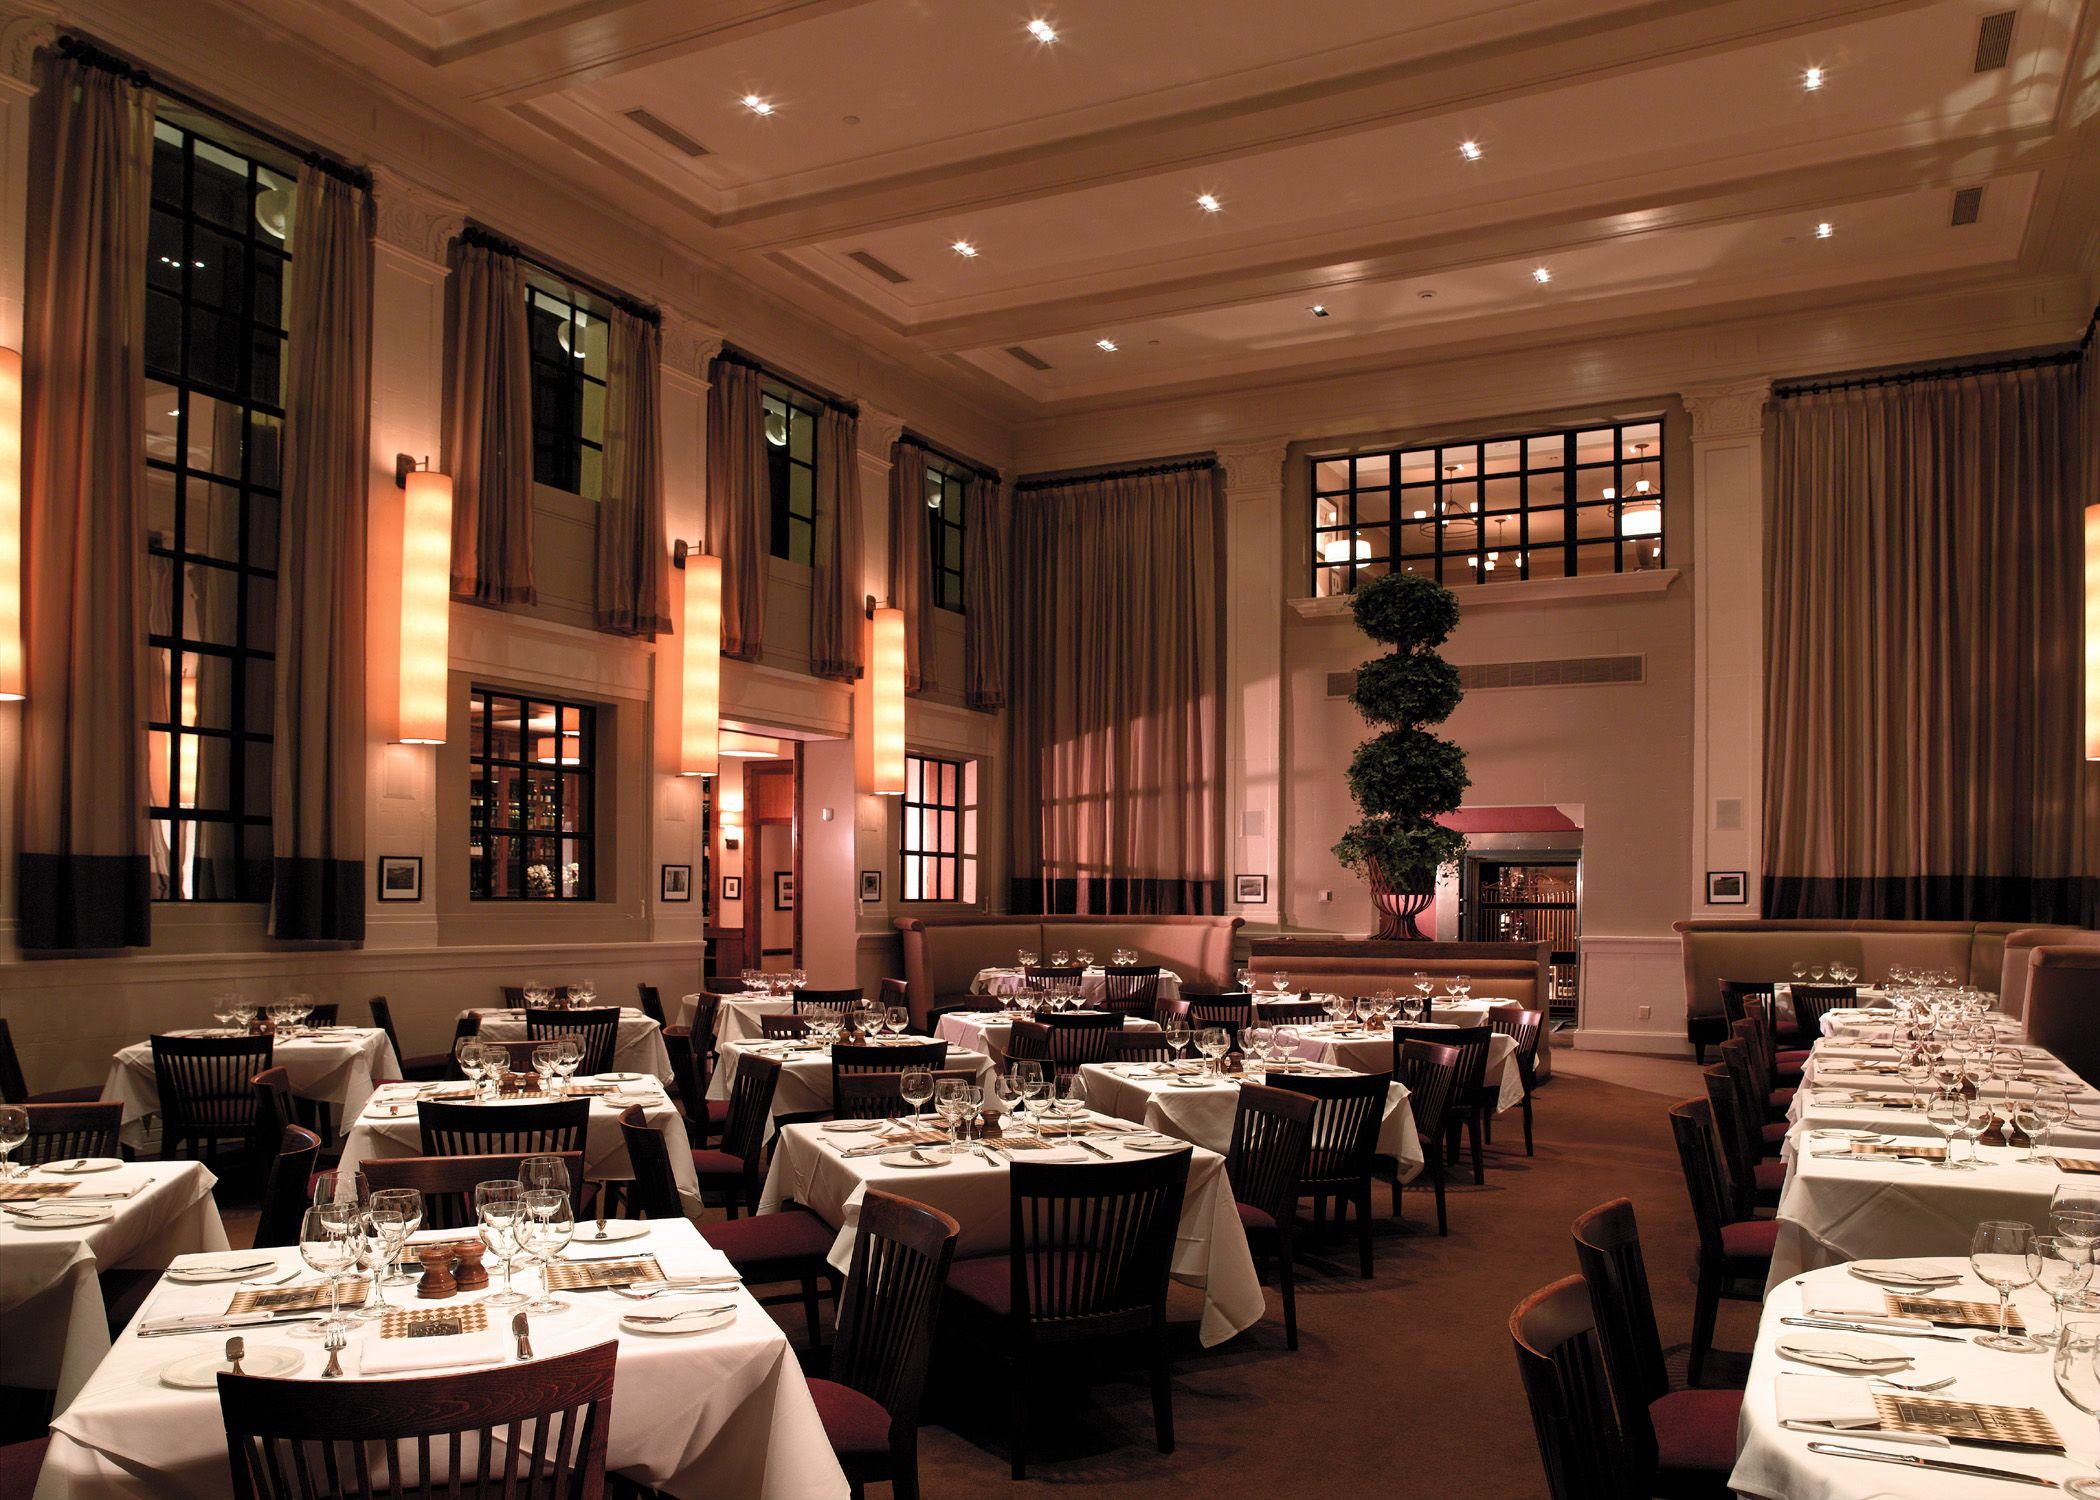 Tellers Chop House, Islip NY | Restaurants | Pinterest | Restaurants ...